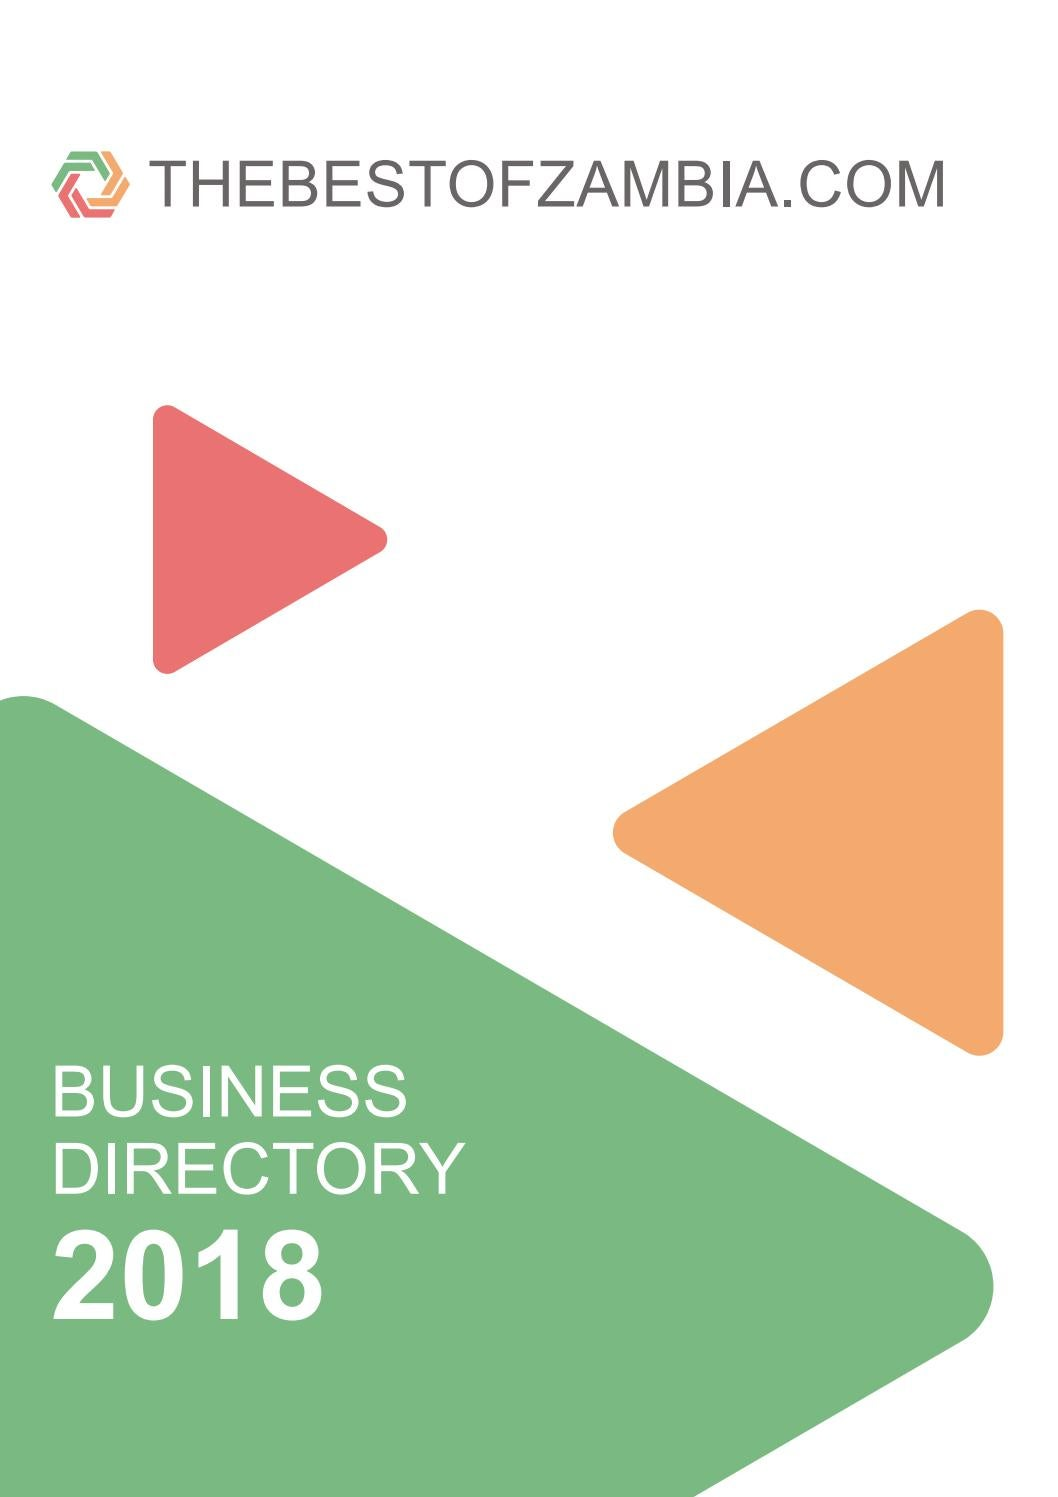 thebestofzambia com business directory 2018 by Infobwana - issuu